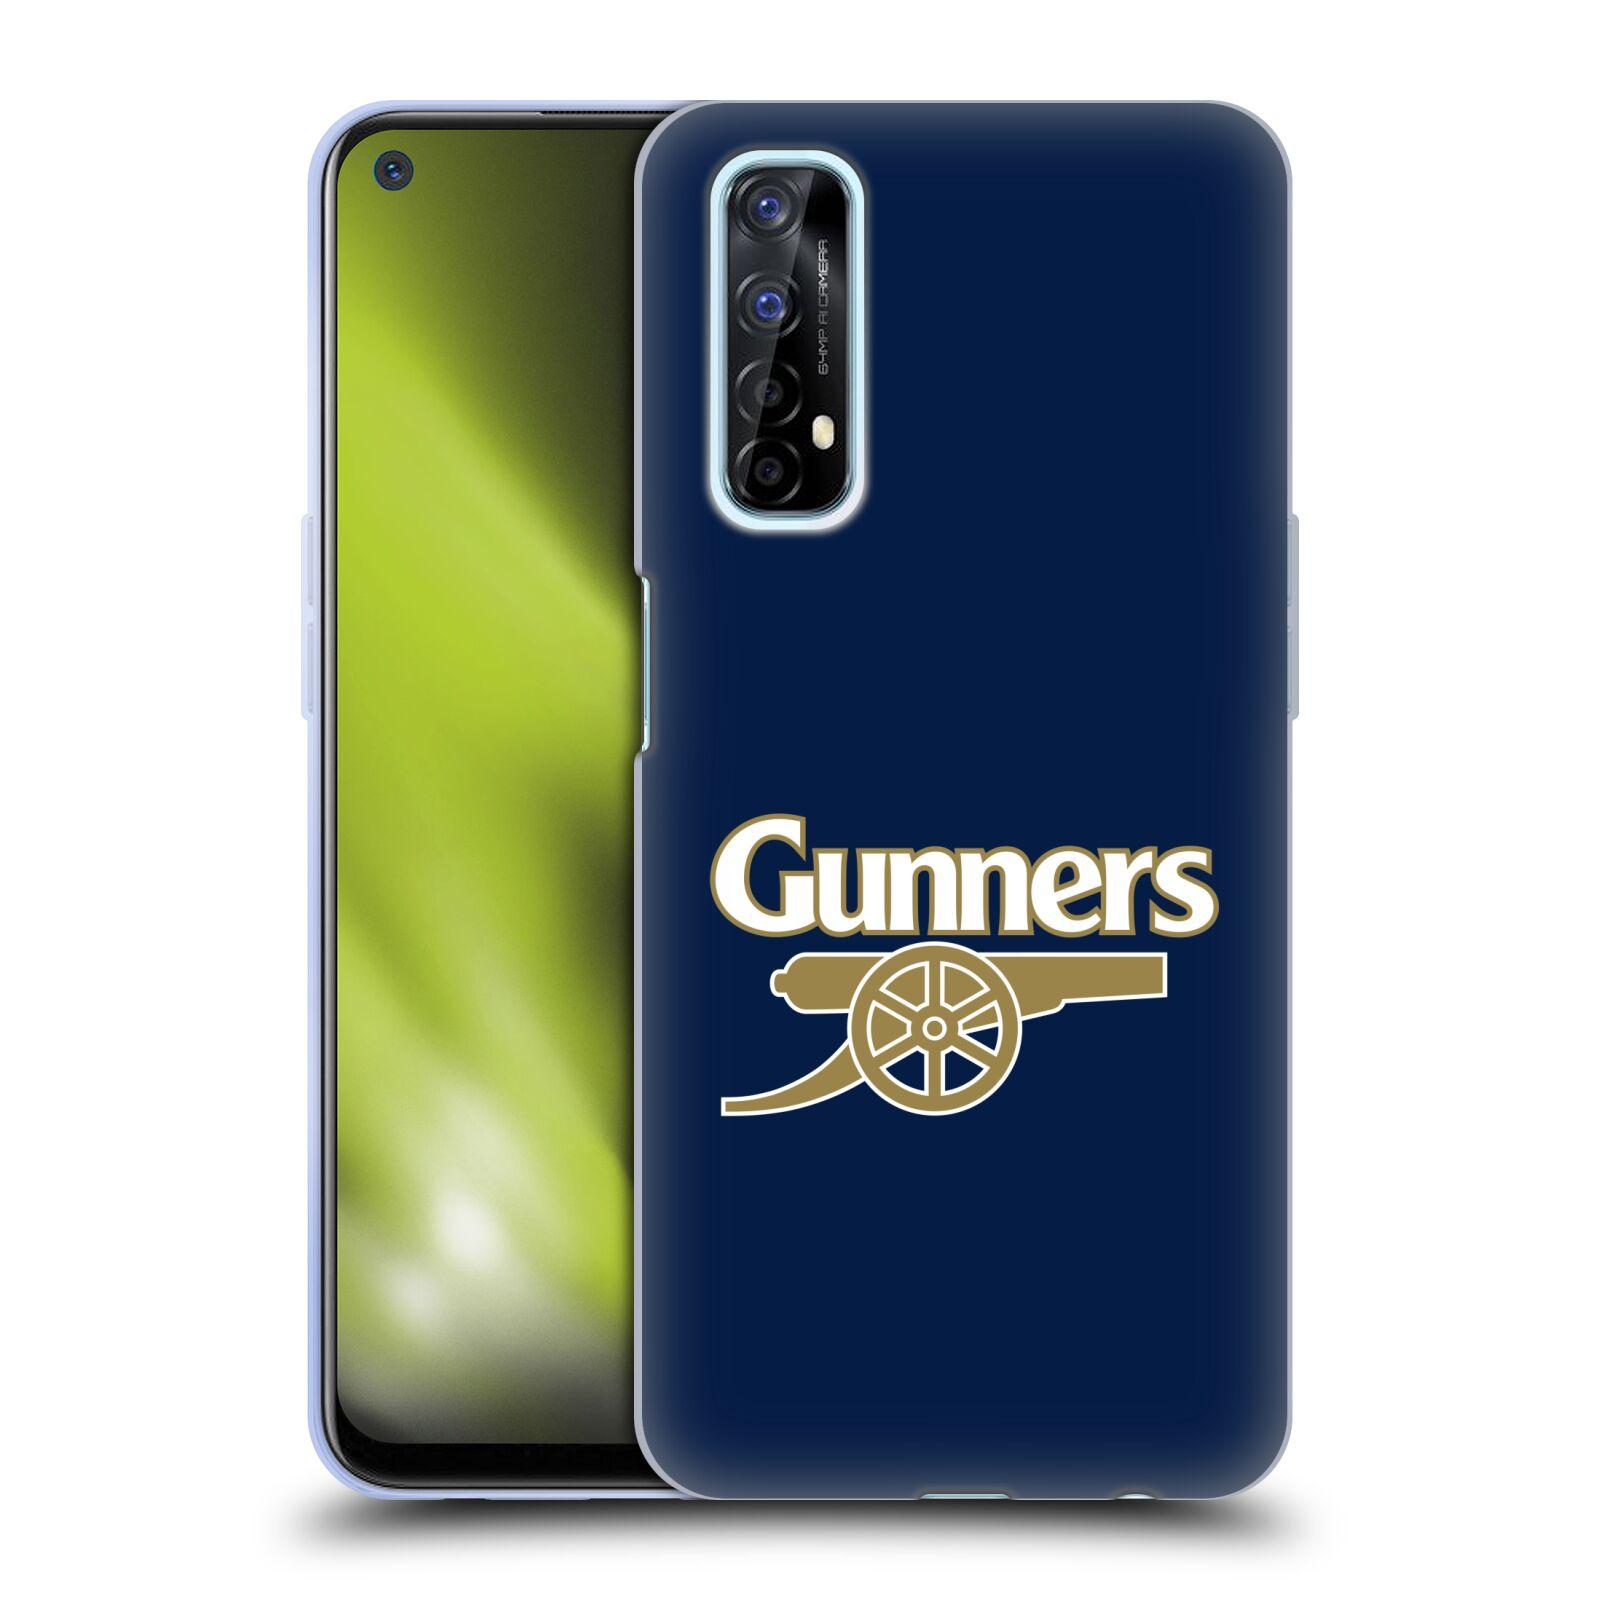 Silikonové pouzdro na mobil Realme 7 - Head Case - Arsenal FC - Gunners